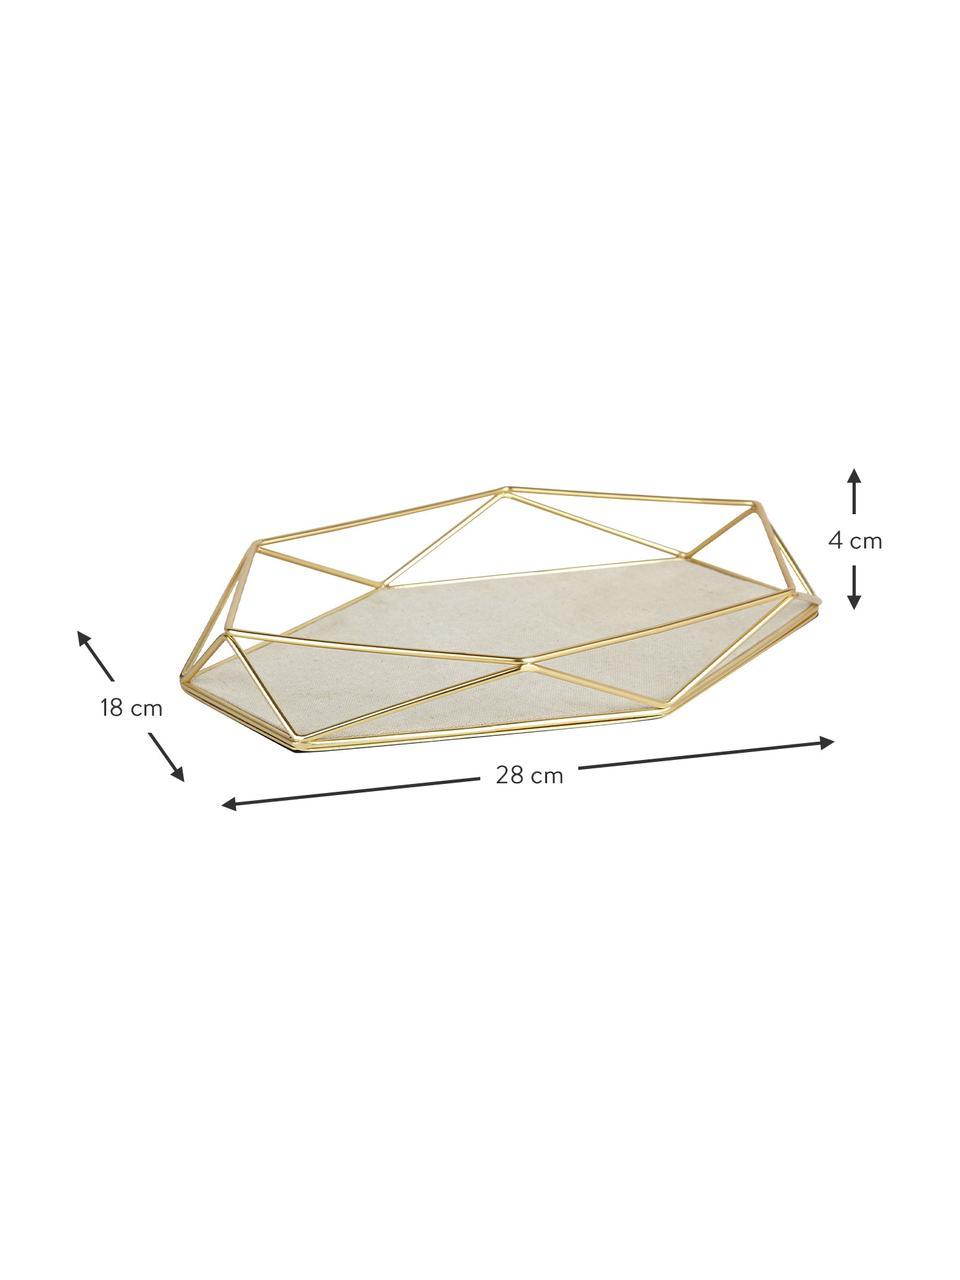 Deko-Tablett Prisma, Gestell: Stahl, vermessingt, Ablagefläche: Stahl, Leinen, Messing, Helles Taupe, 28 x 4 cm